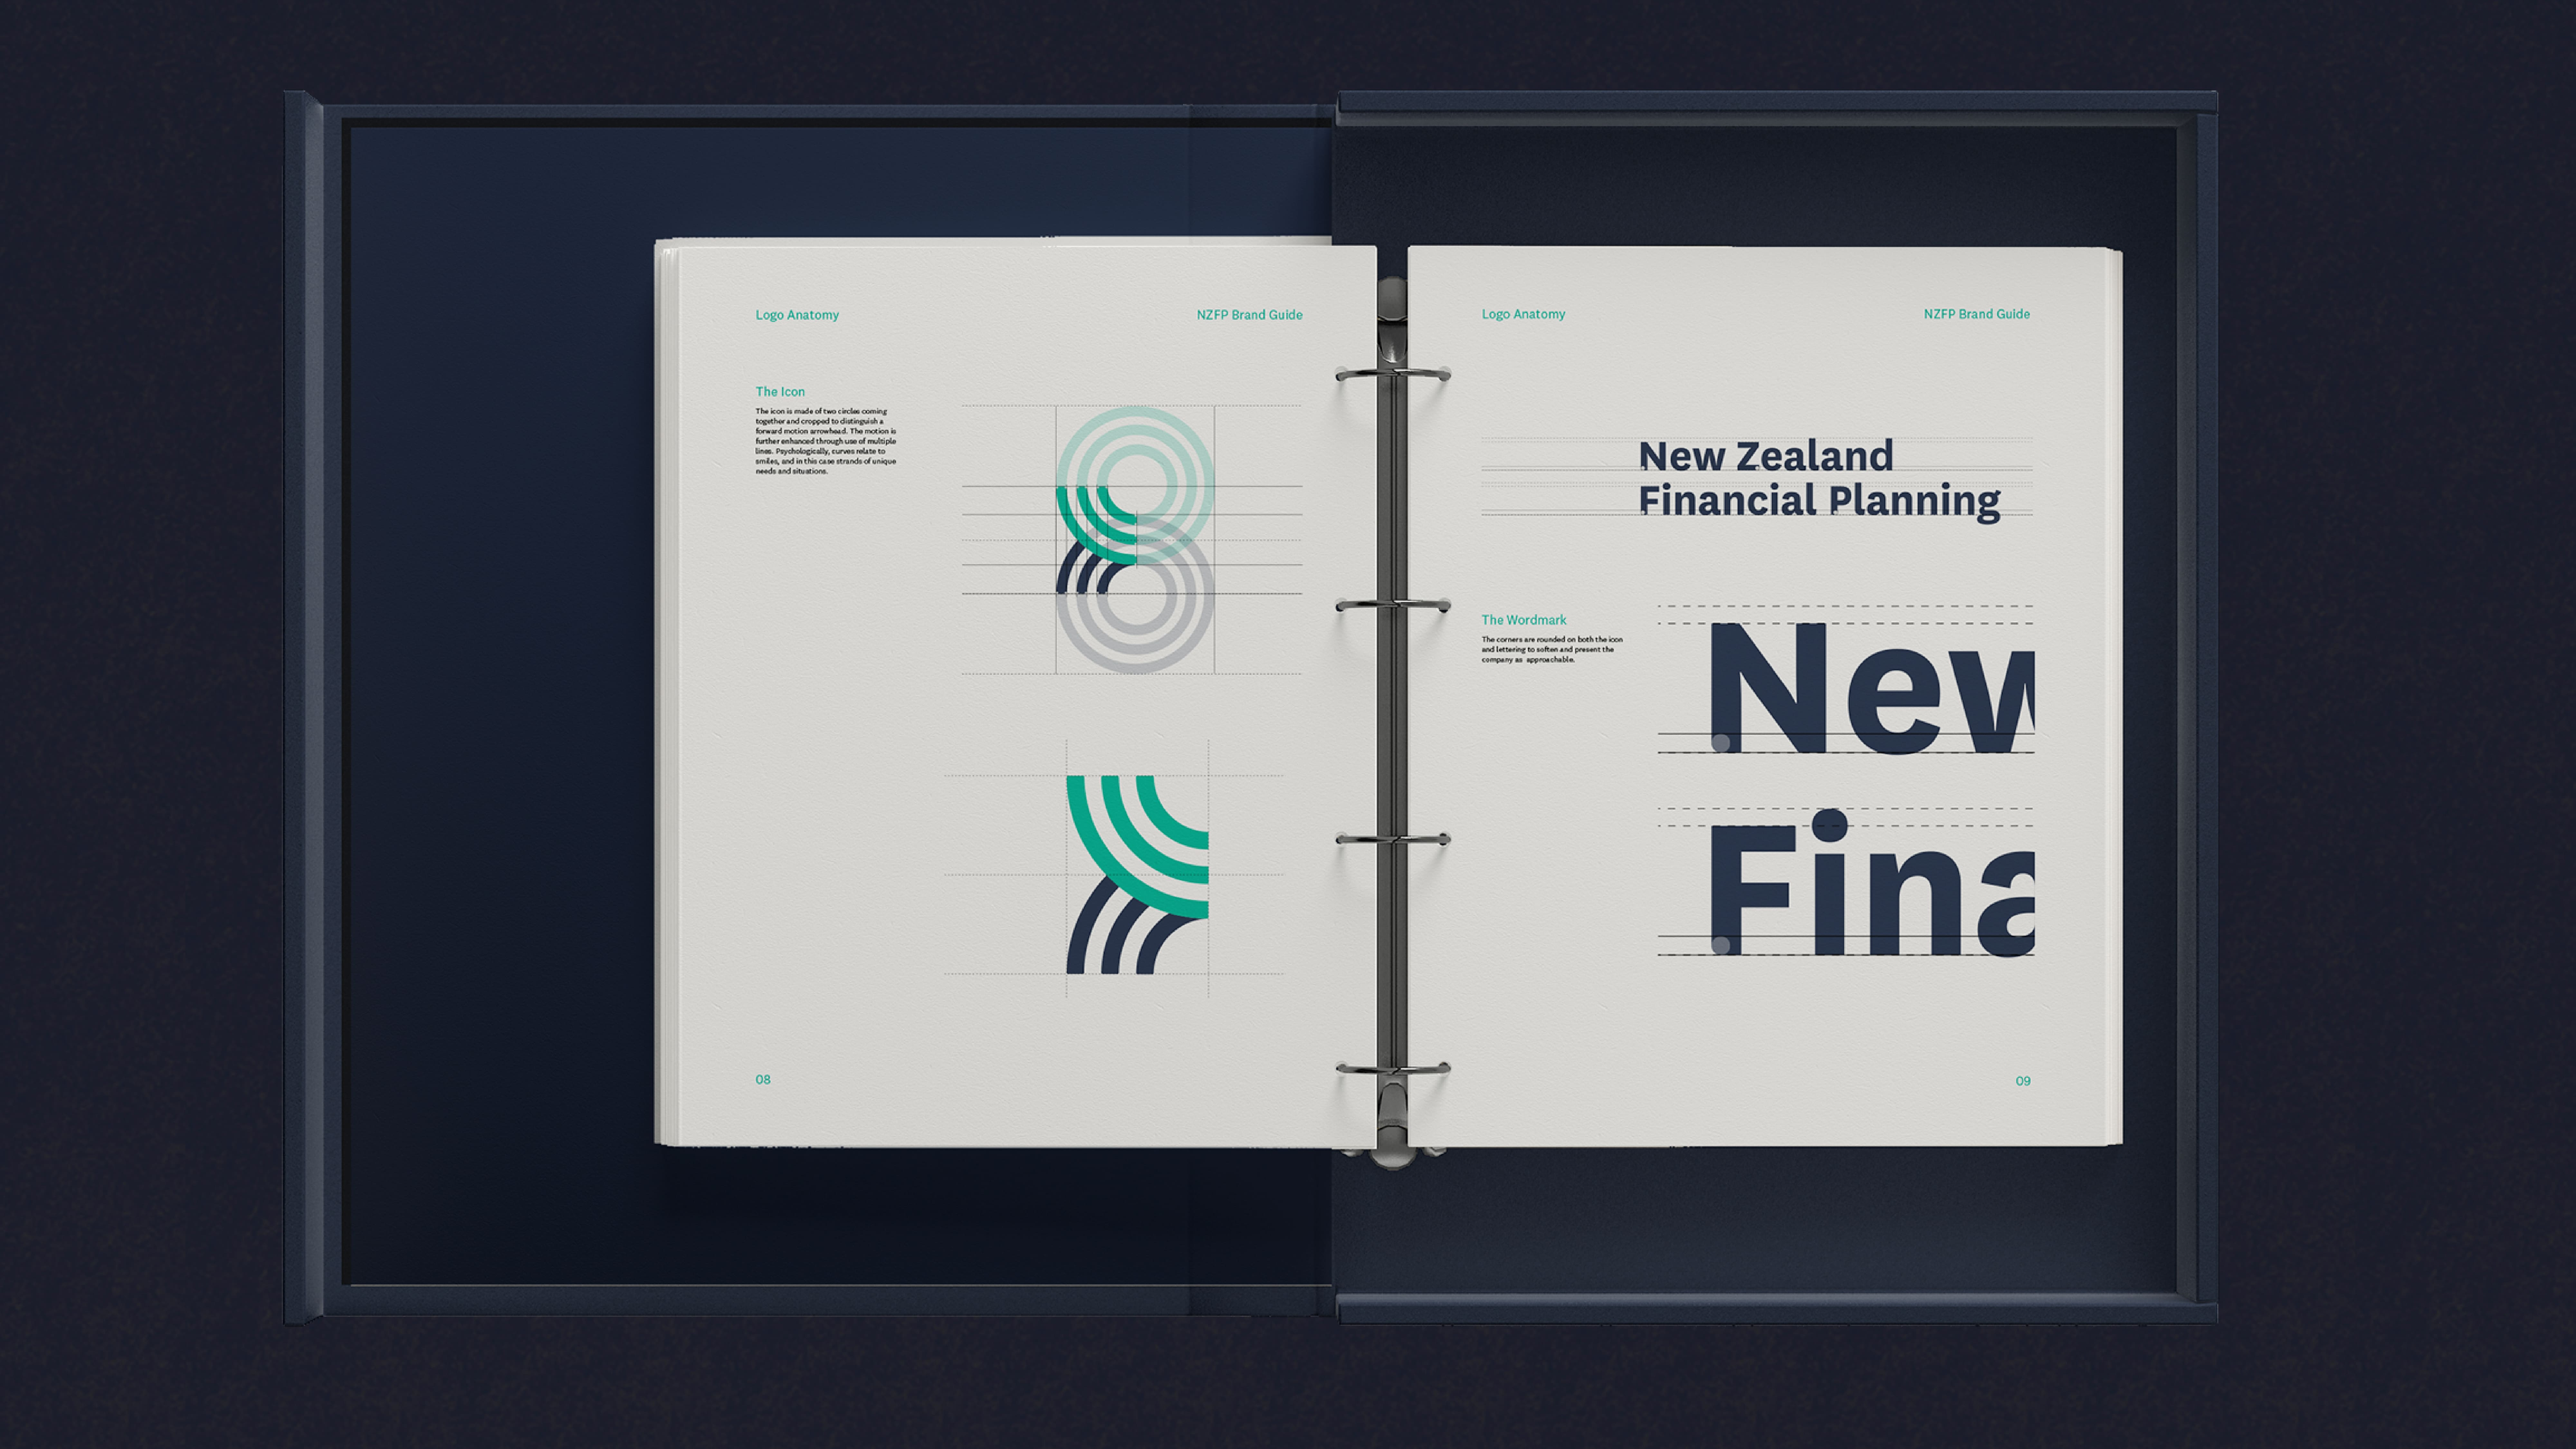 attraction studio new zealand financial planning project binder